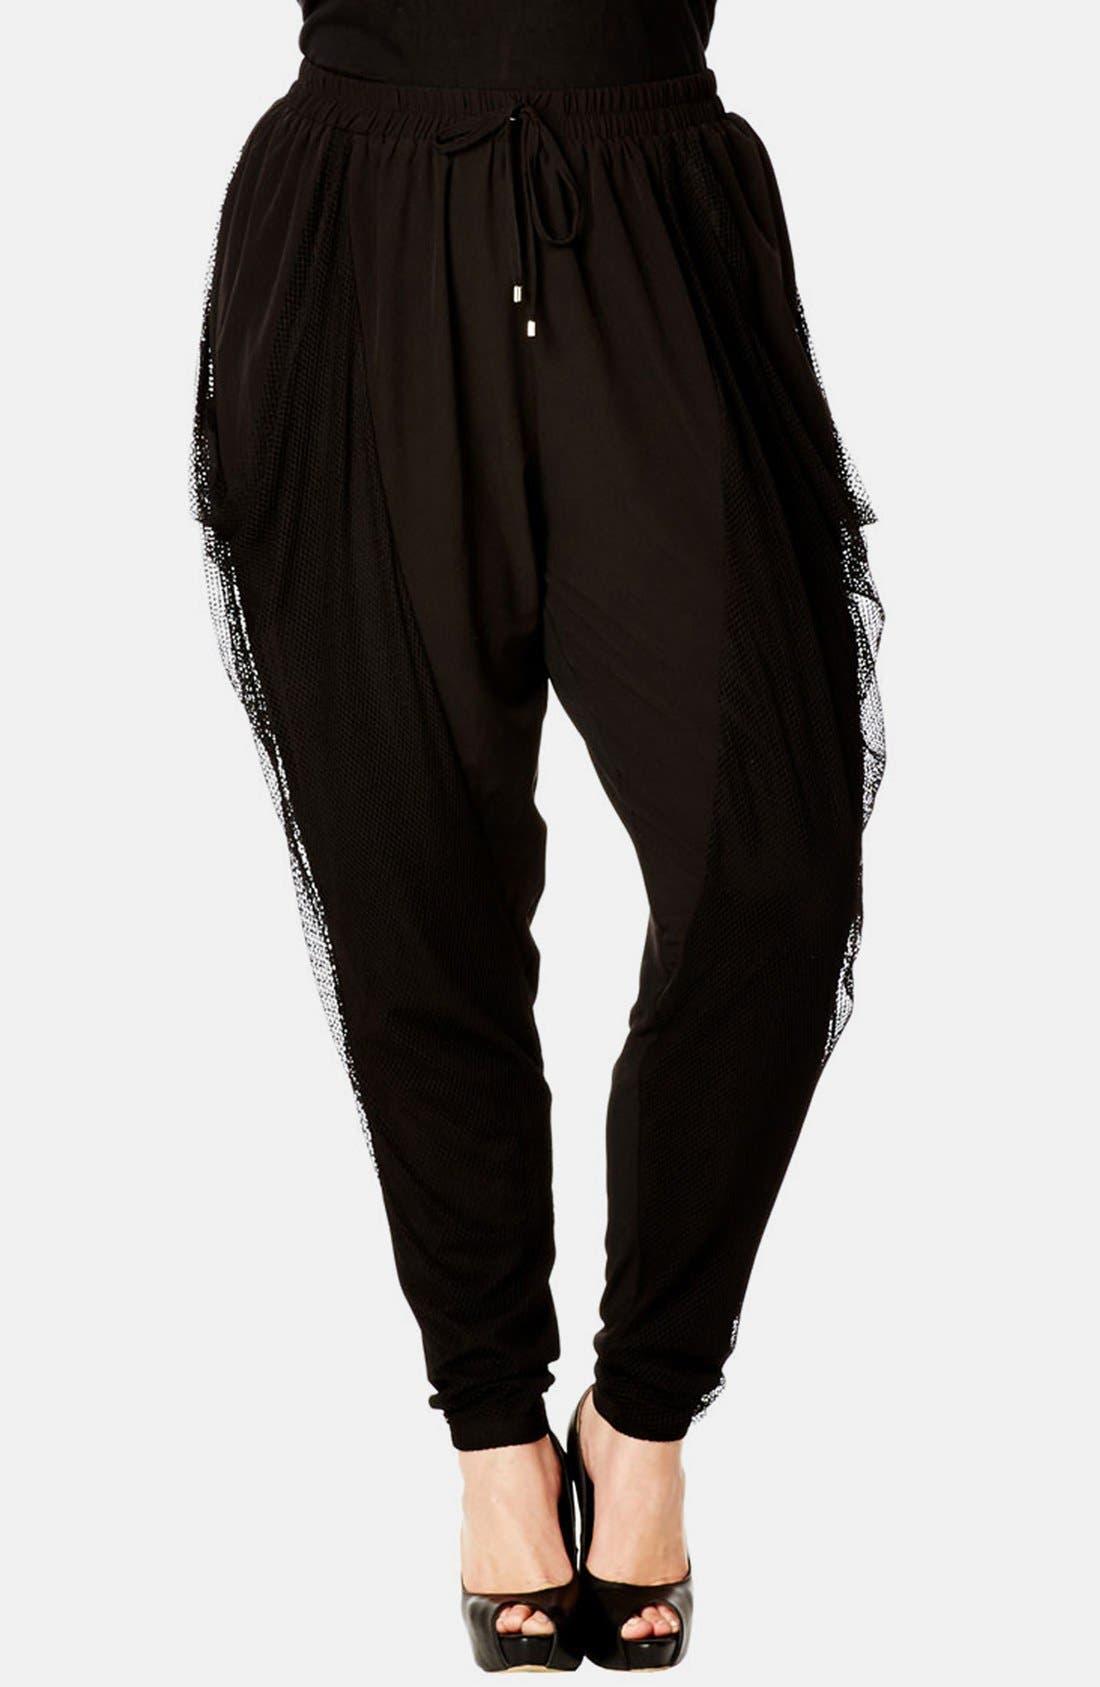 Main Image - City Chic 'Urban Harem' Mesh Overlay Pants (Plus Size)